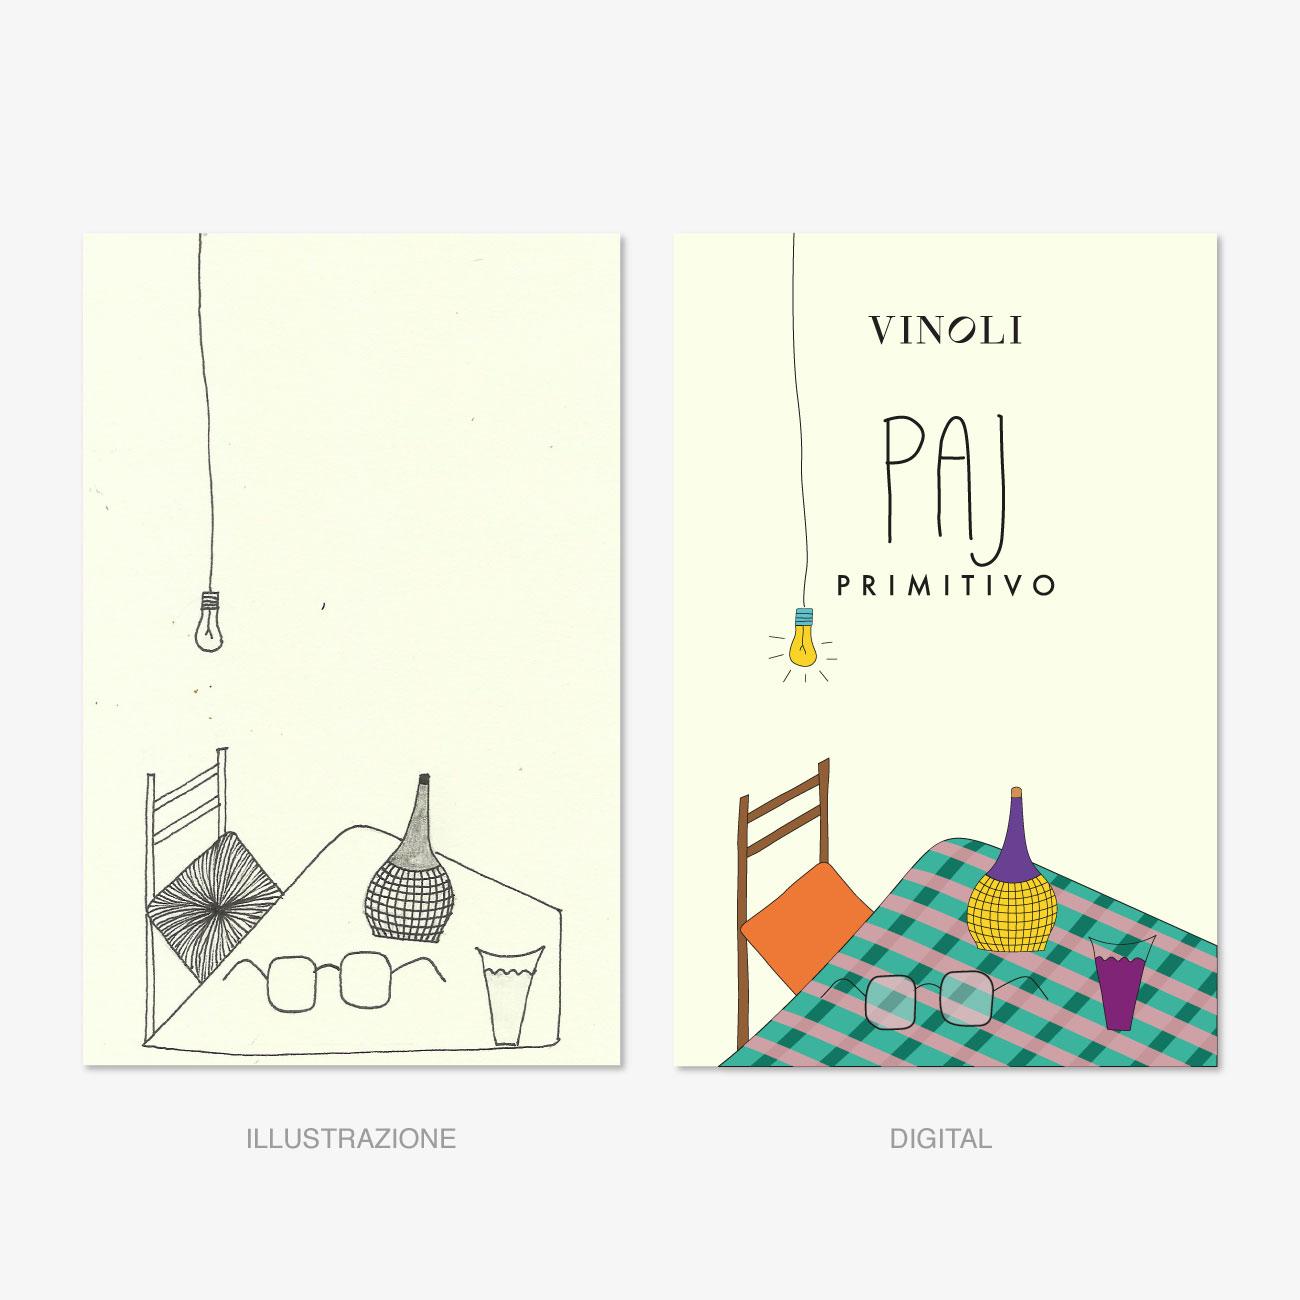 https://www.orlandinifrancesco.com/wp/wp-content/uploads/2019/07/Digital-Label-paj-Cantina-Vinoli.jpg